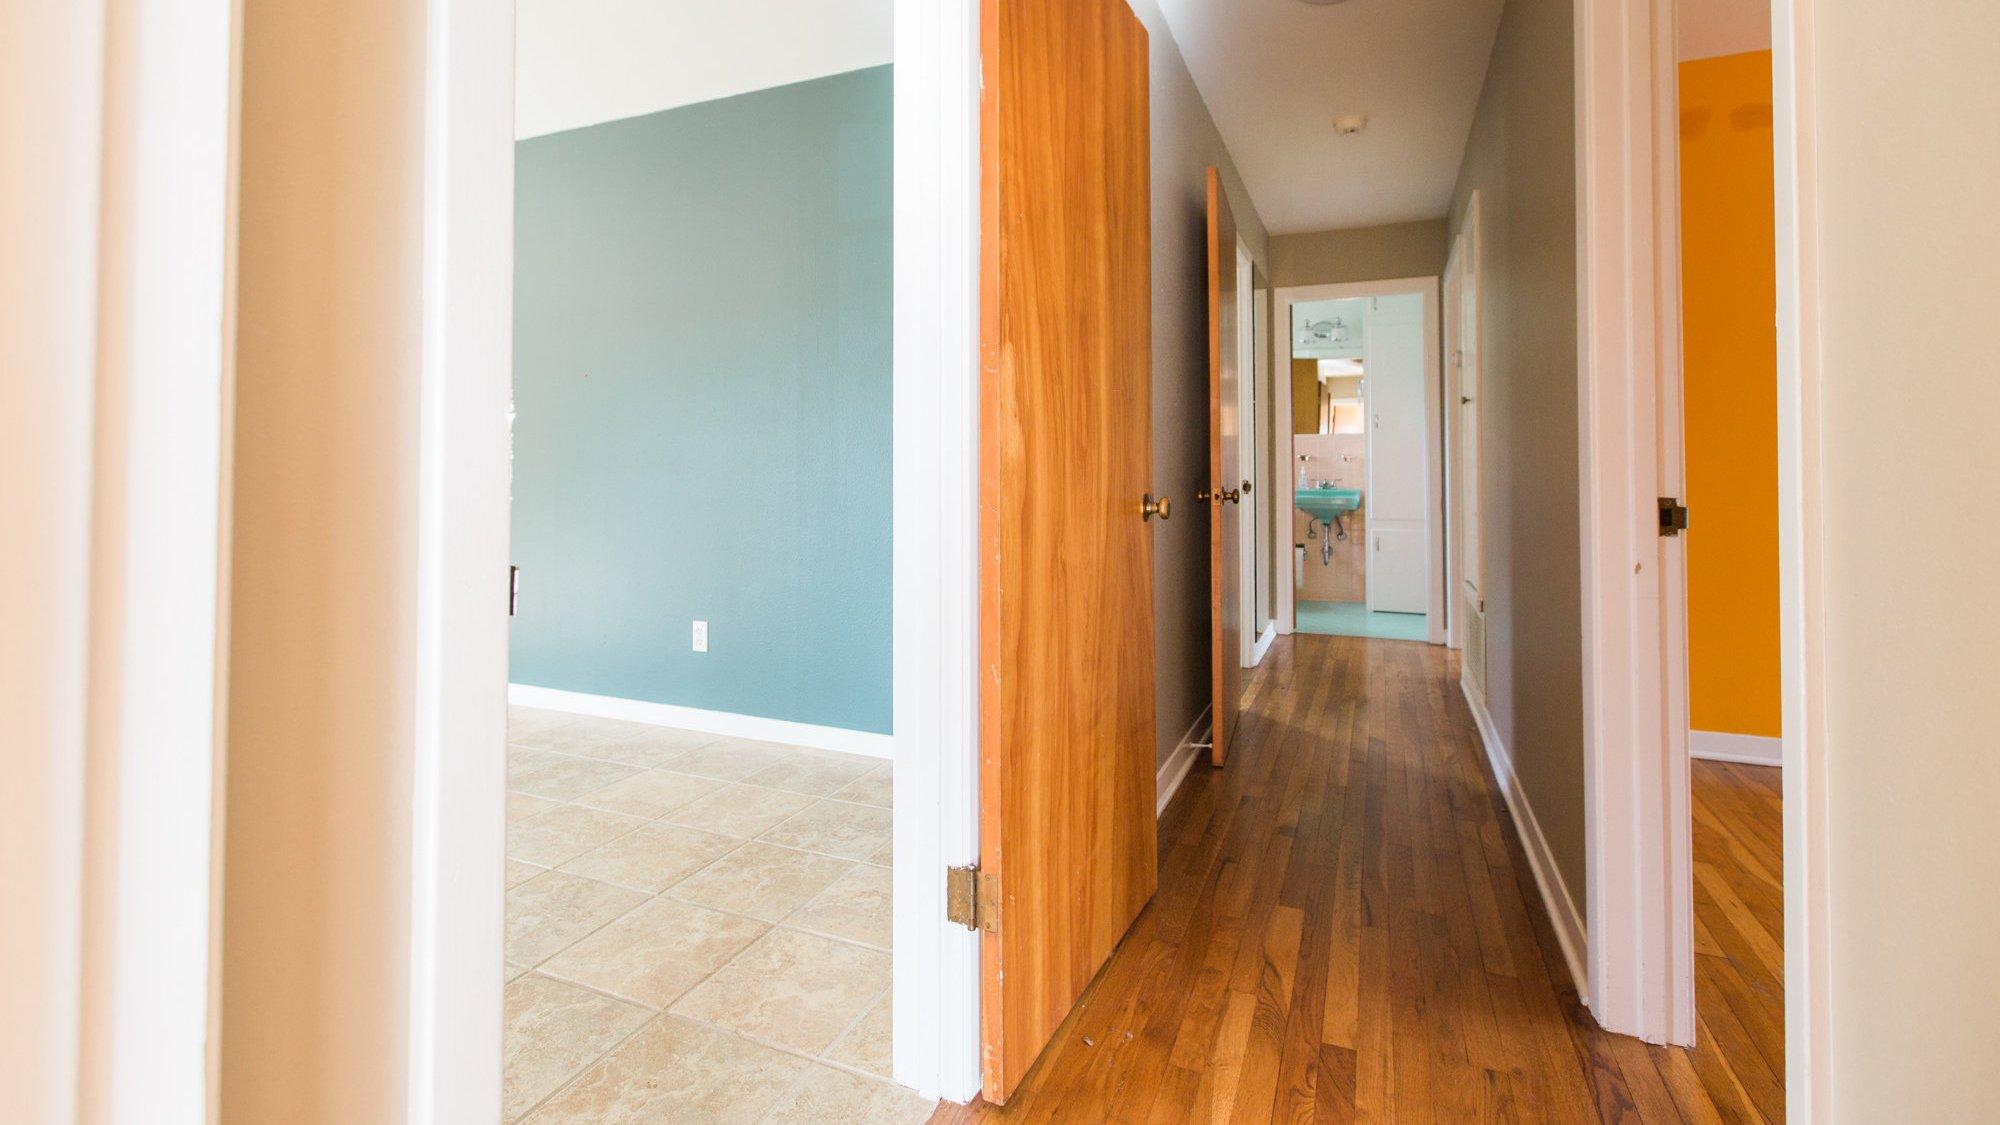 Love_Ding_Blog_Home_Renovation_Renovateding_Ranch_Style_House_DianaAscarrunz_Photography.jpg